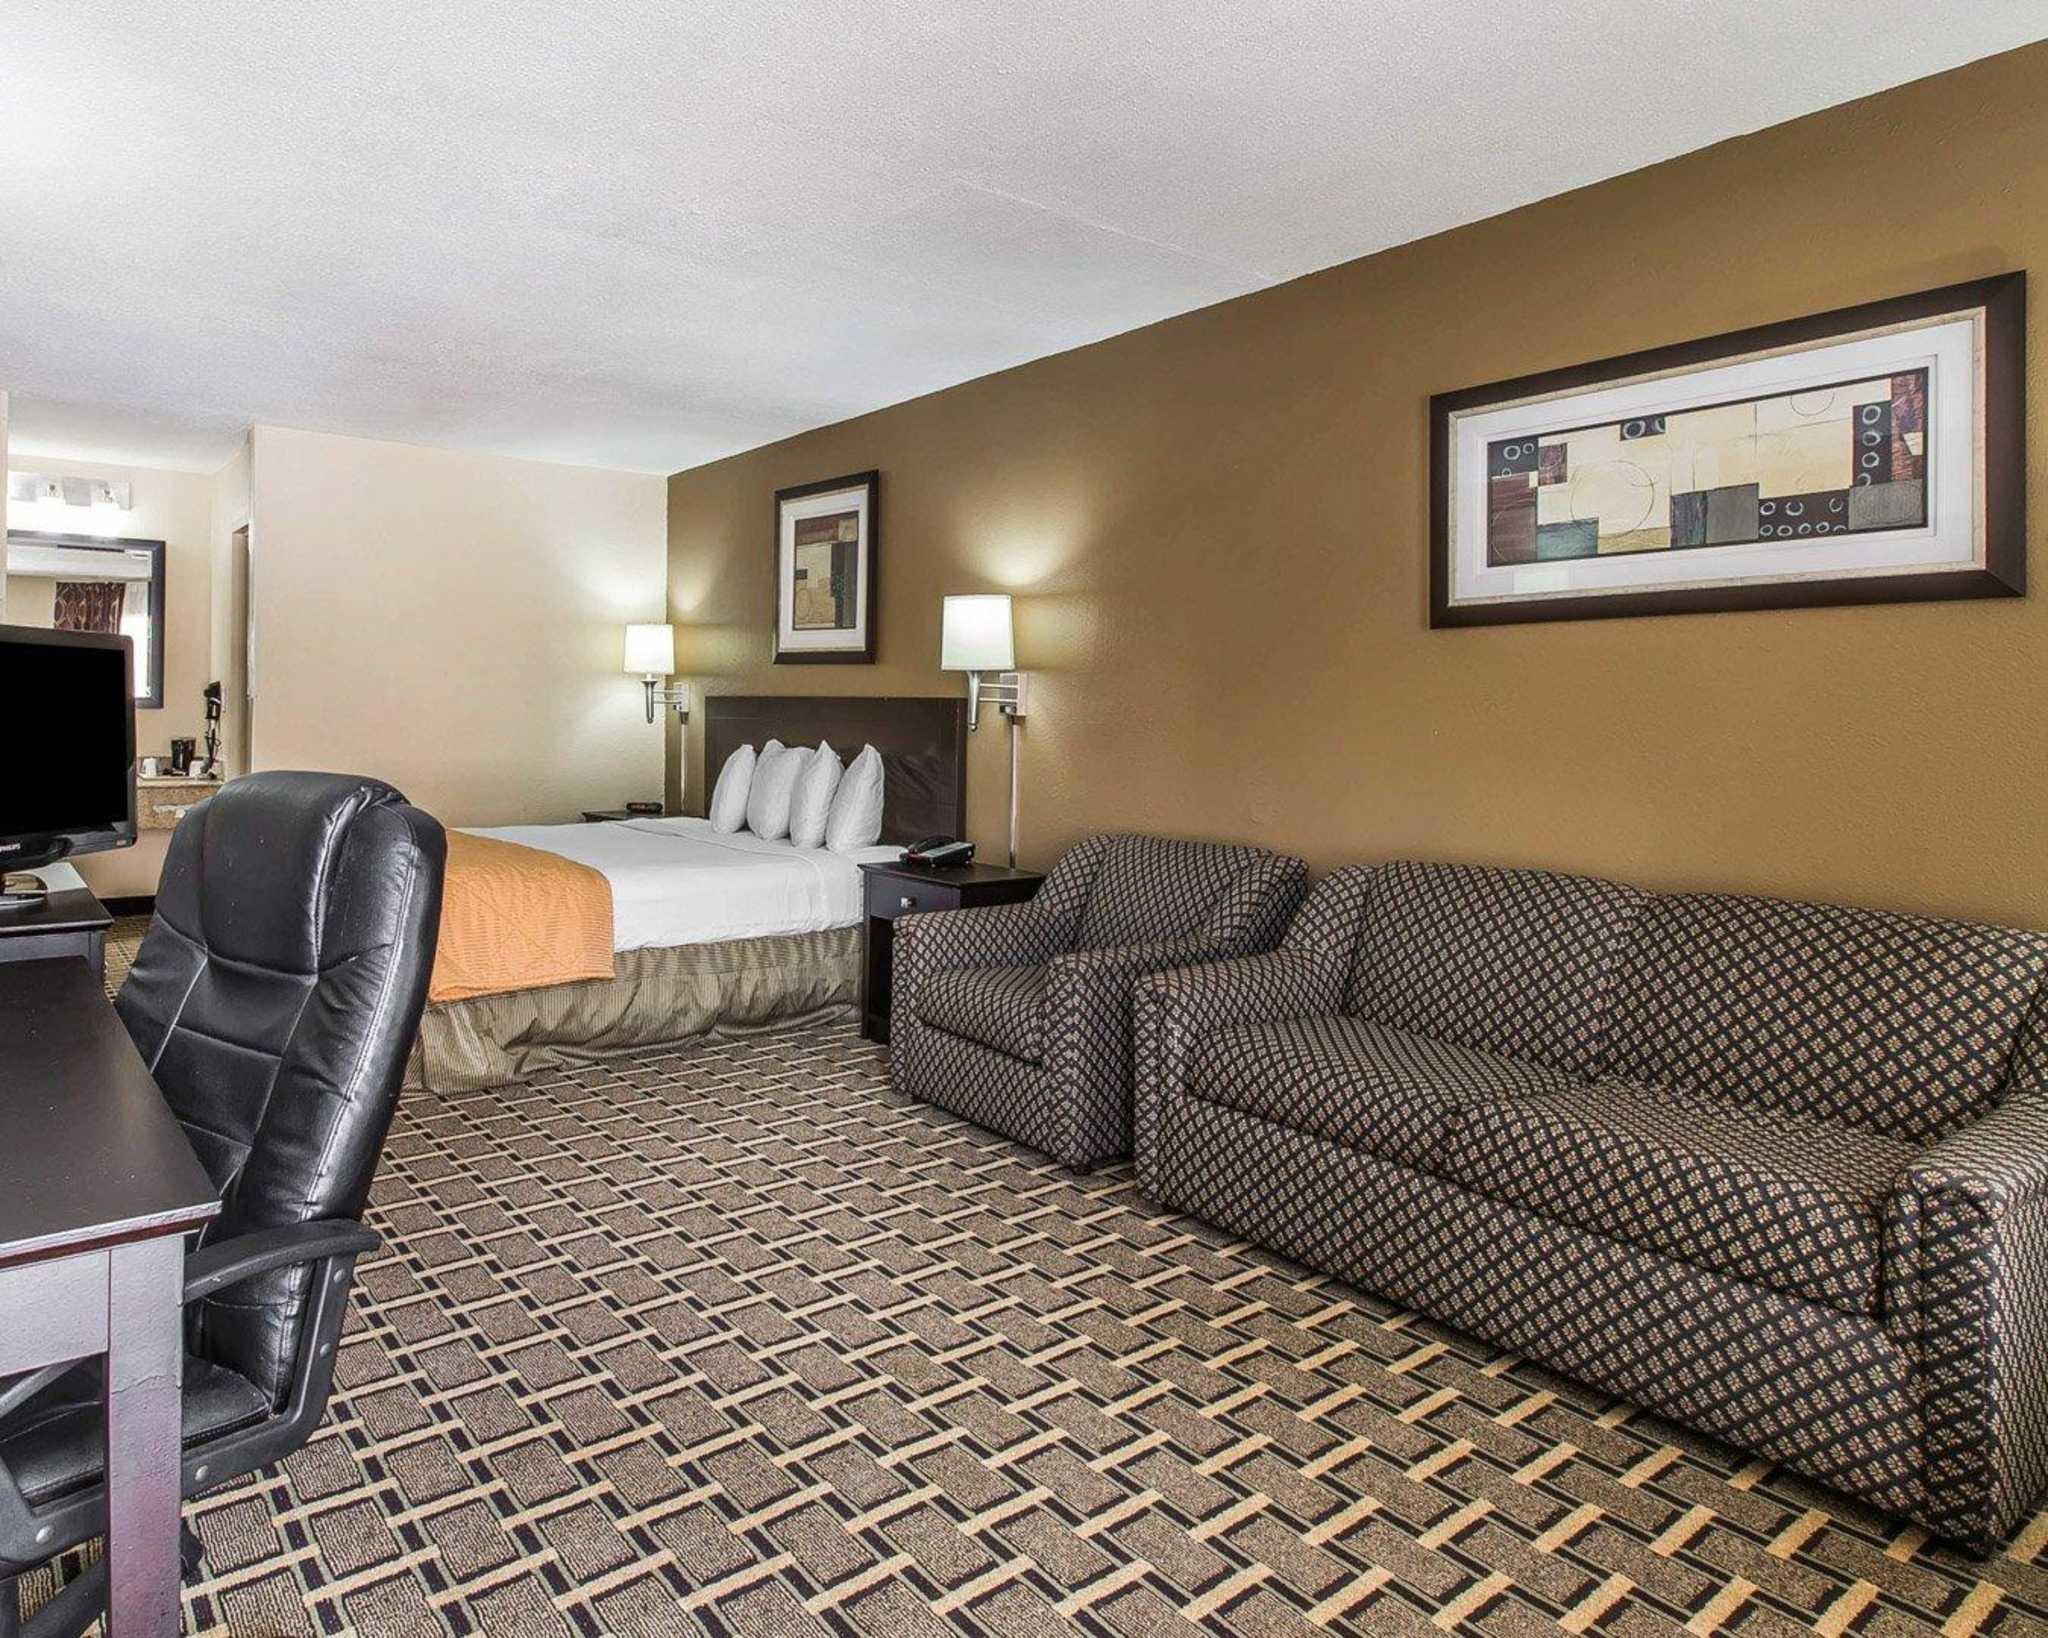 Quality Inn Kingsland image 5